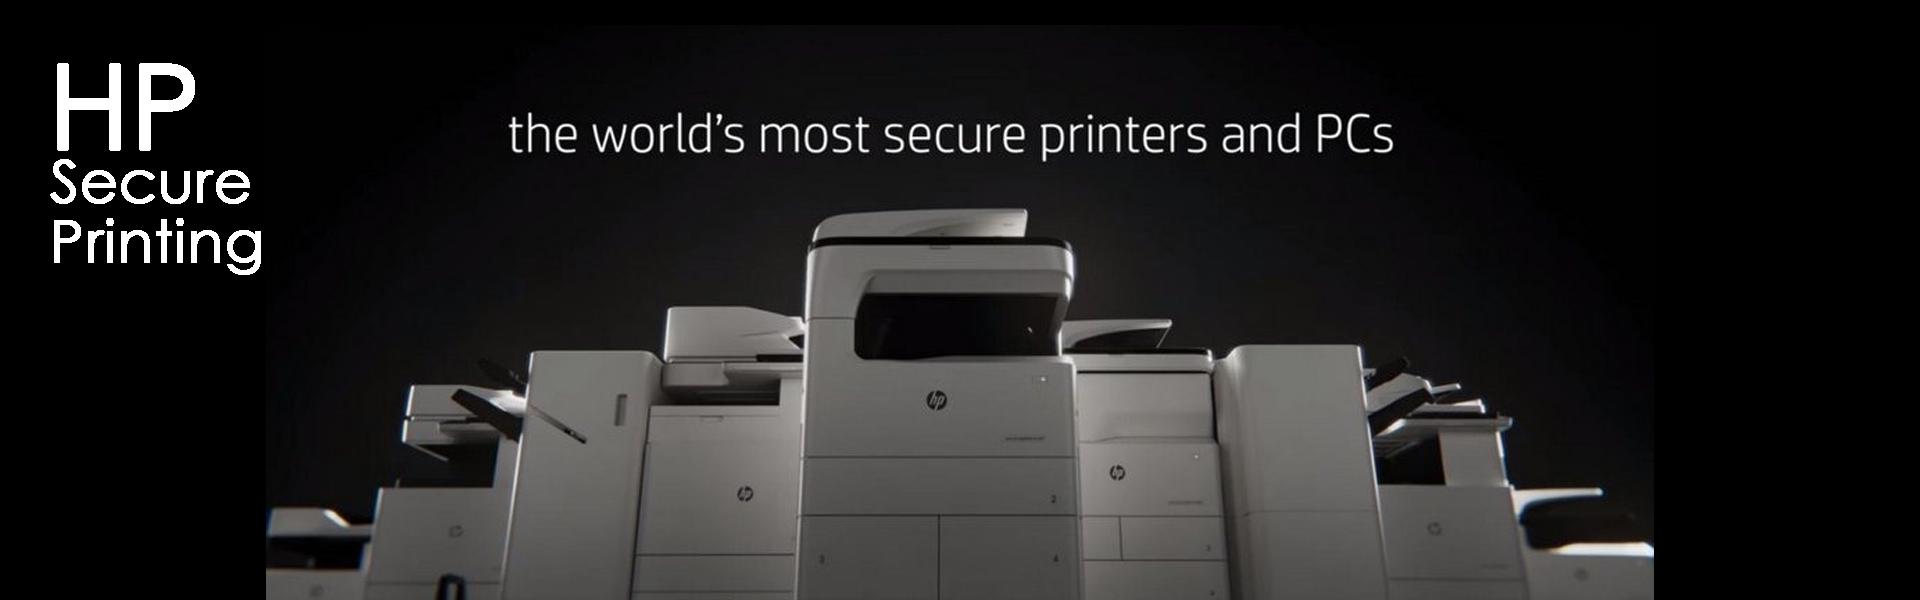 HP Secure Printing Banner